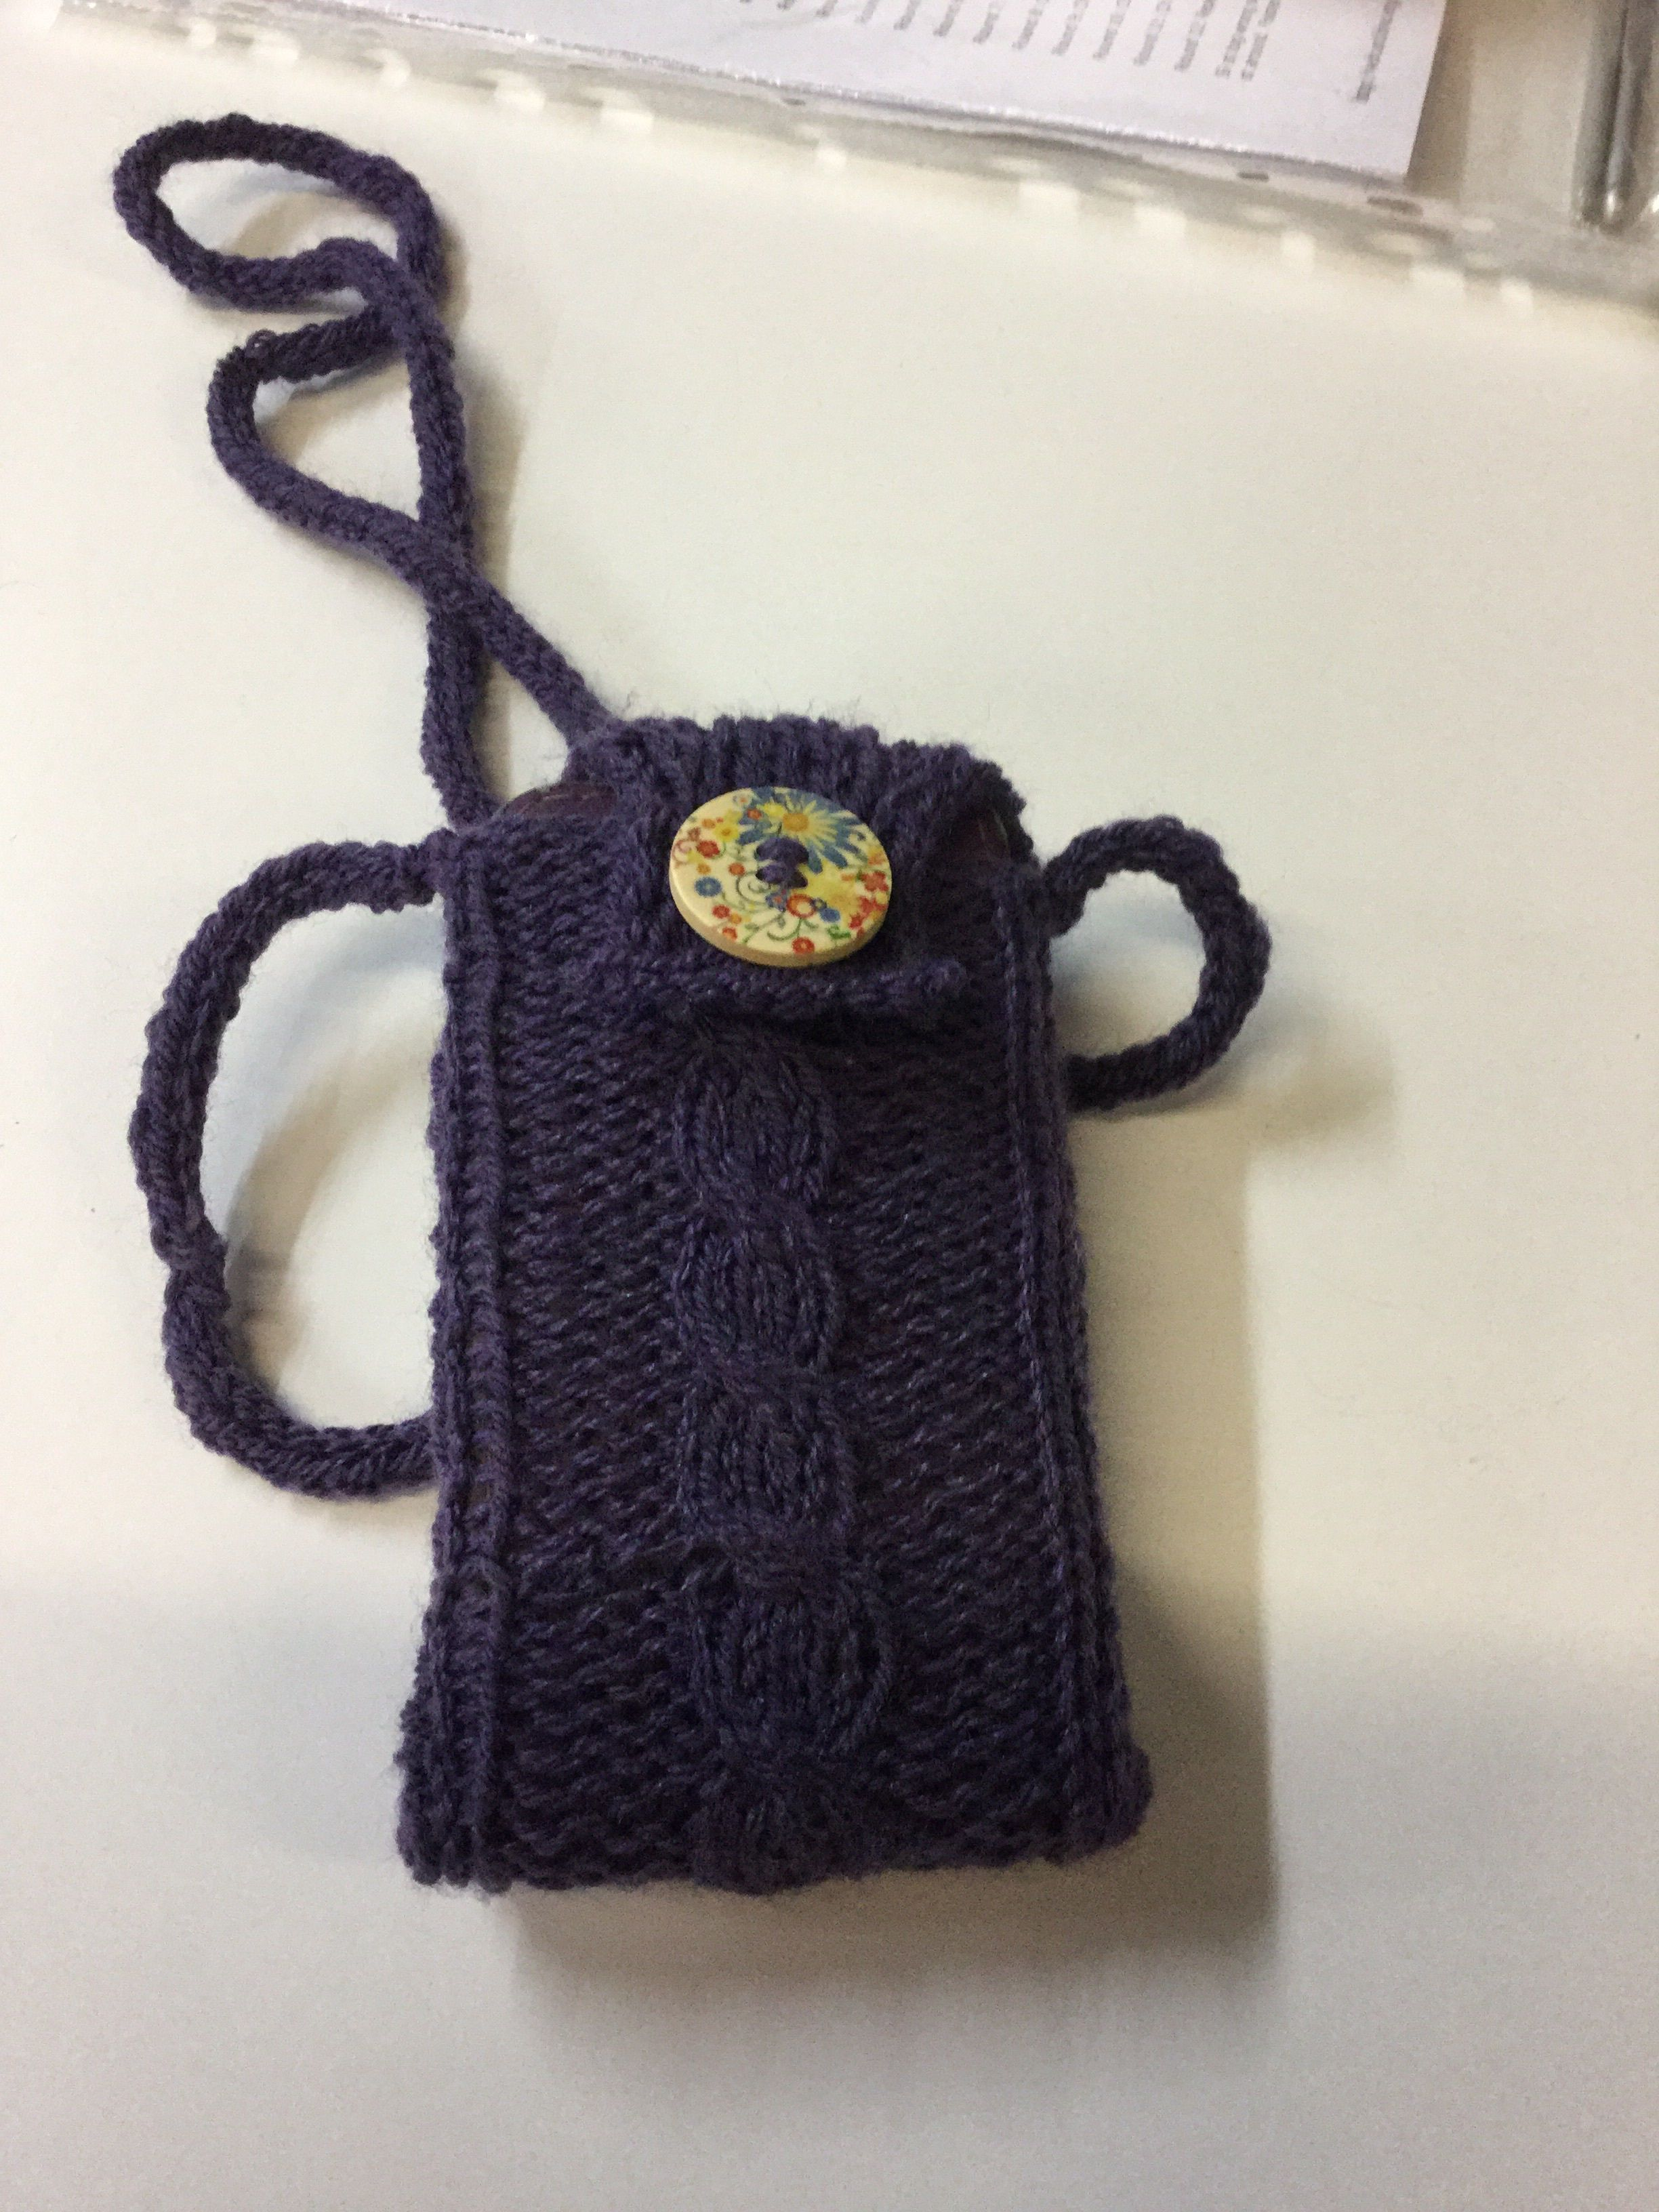 Knitting Groups Glasgow : Photos glasgow knit n stitch scotland meetup